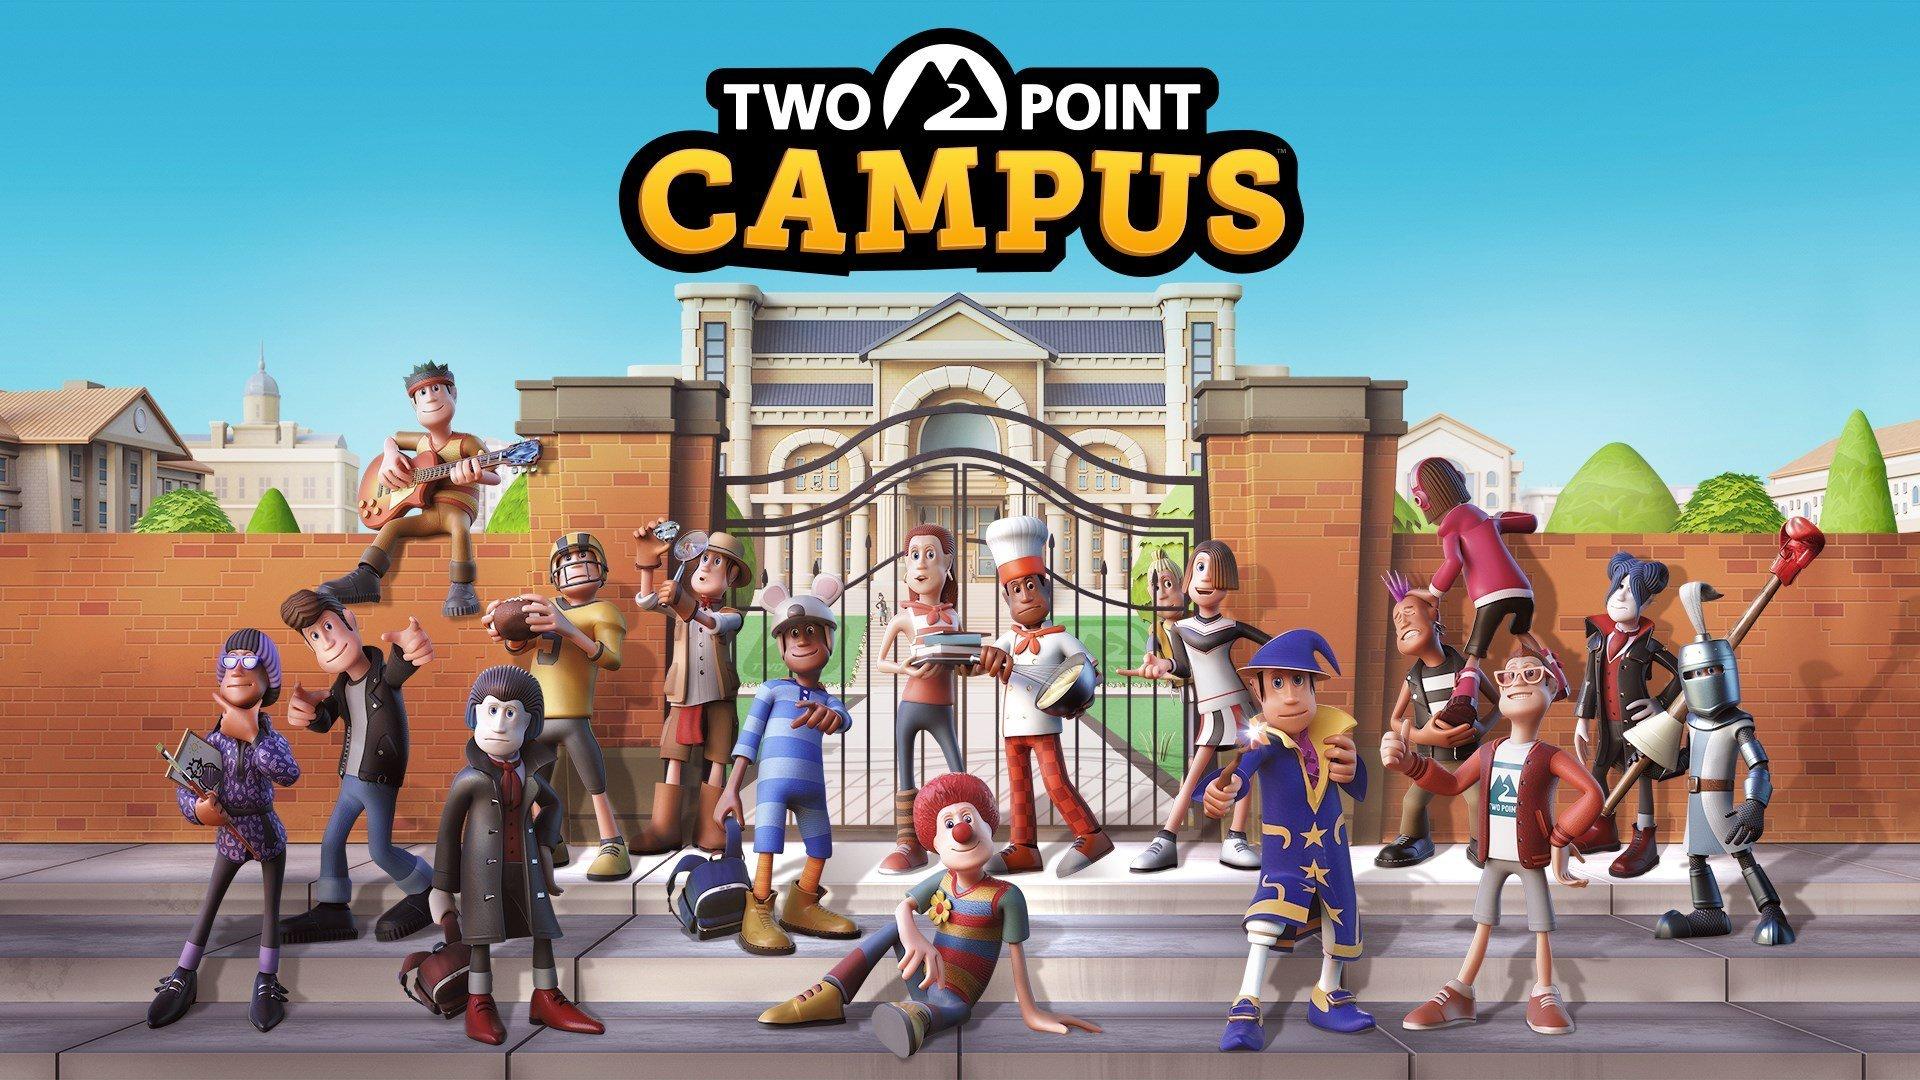 Ny Two Point Studios-titel avslöjad via Microsoft Store